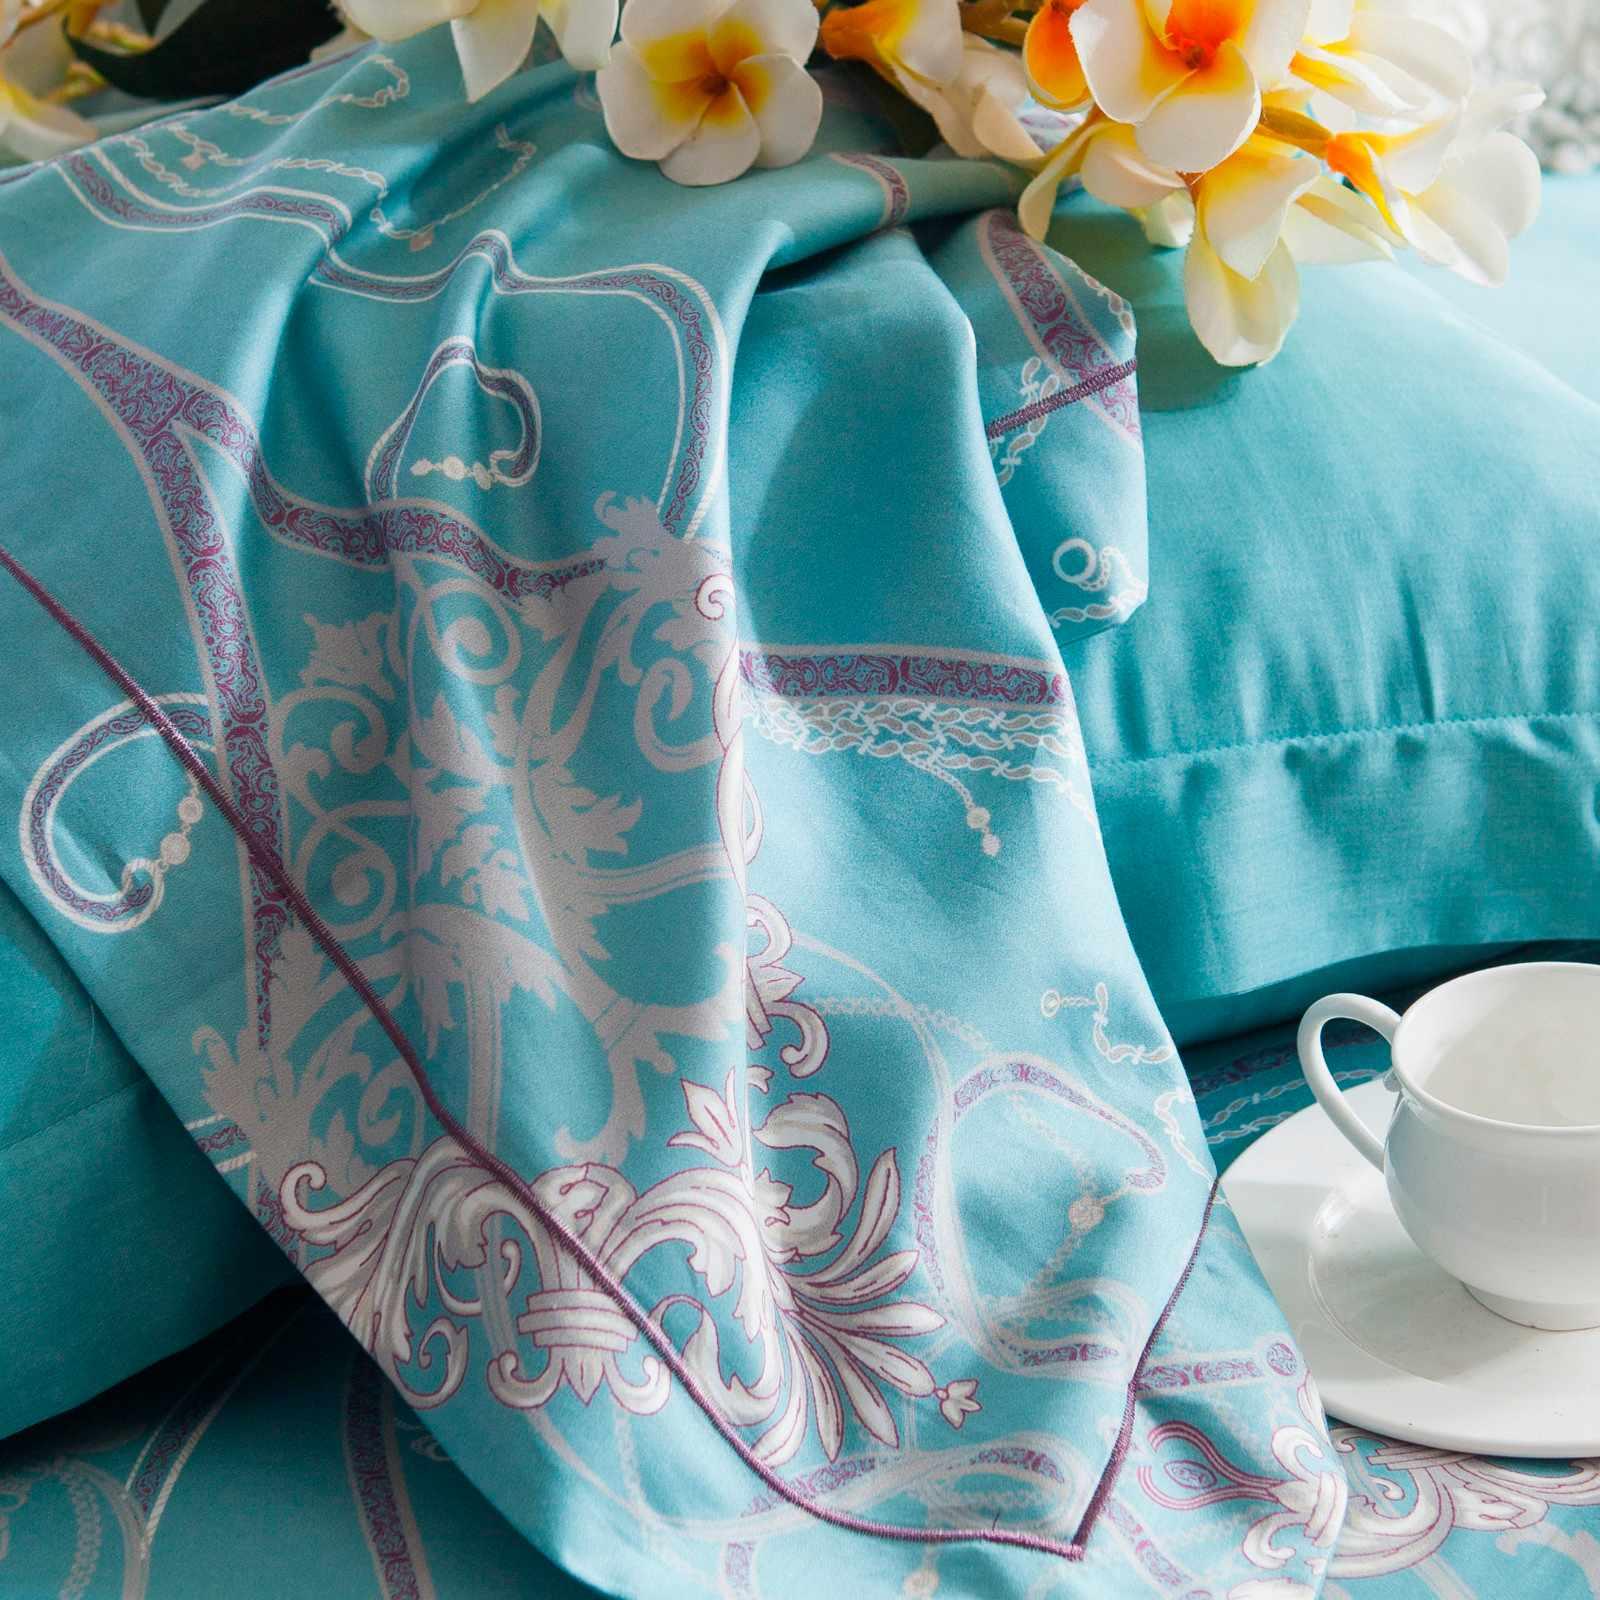 Daphne Fascinating Designed Pima Cotton Bedding  6866 100% Cotton Printed image35